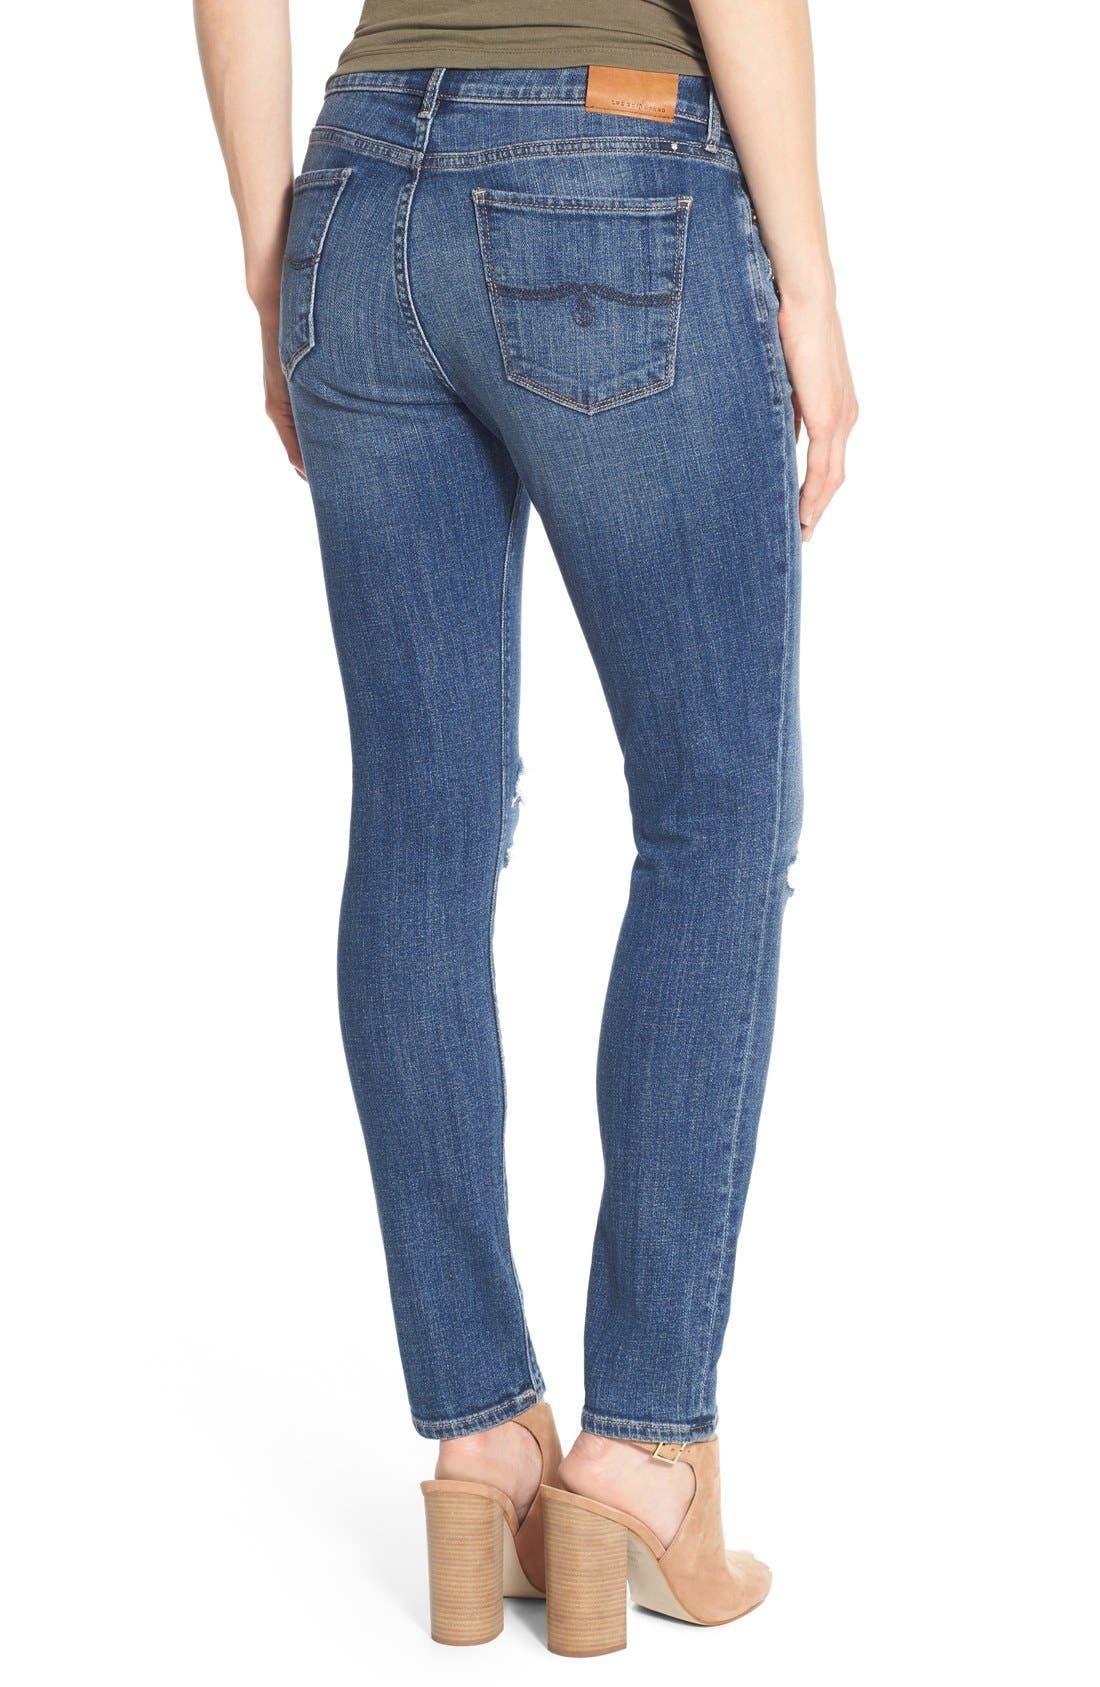 Alternate Image 3  - Lucky Brand 'Lolita' Distressed Stretch Skinny Jeans (Morrison)